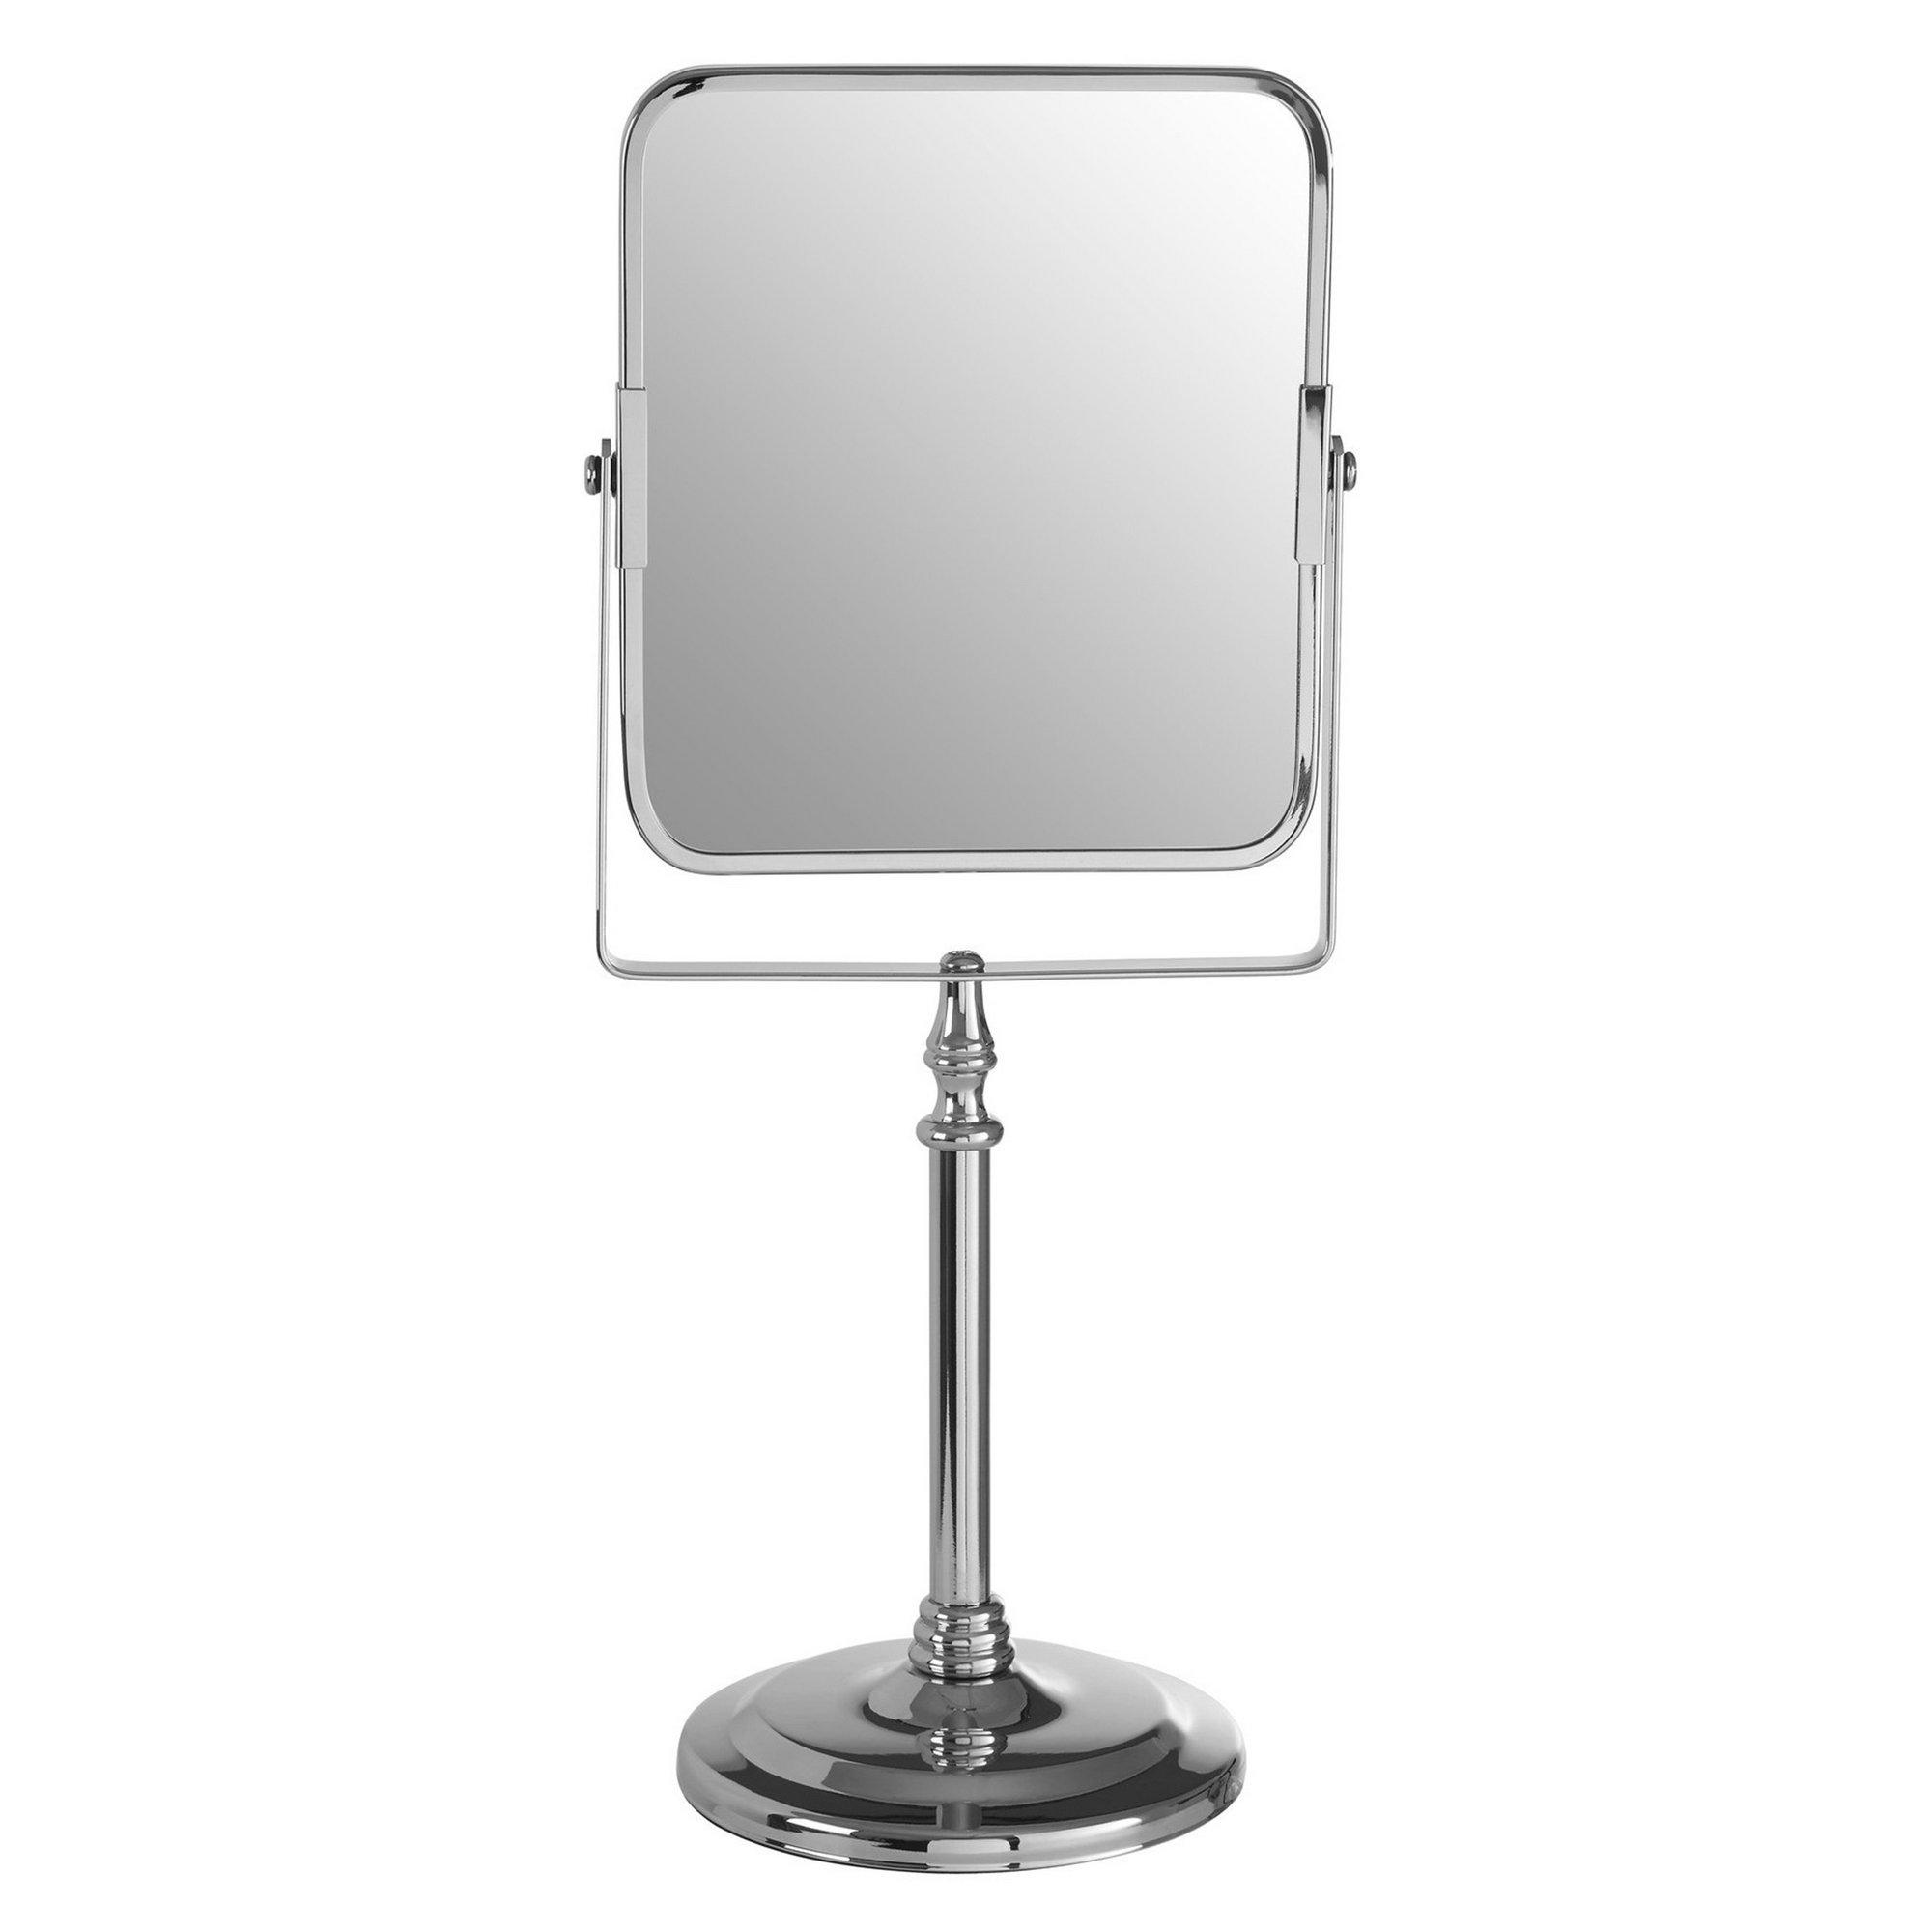 Image of Cassini Square Table Mirror